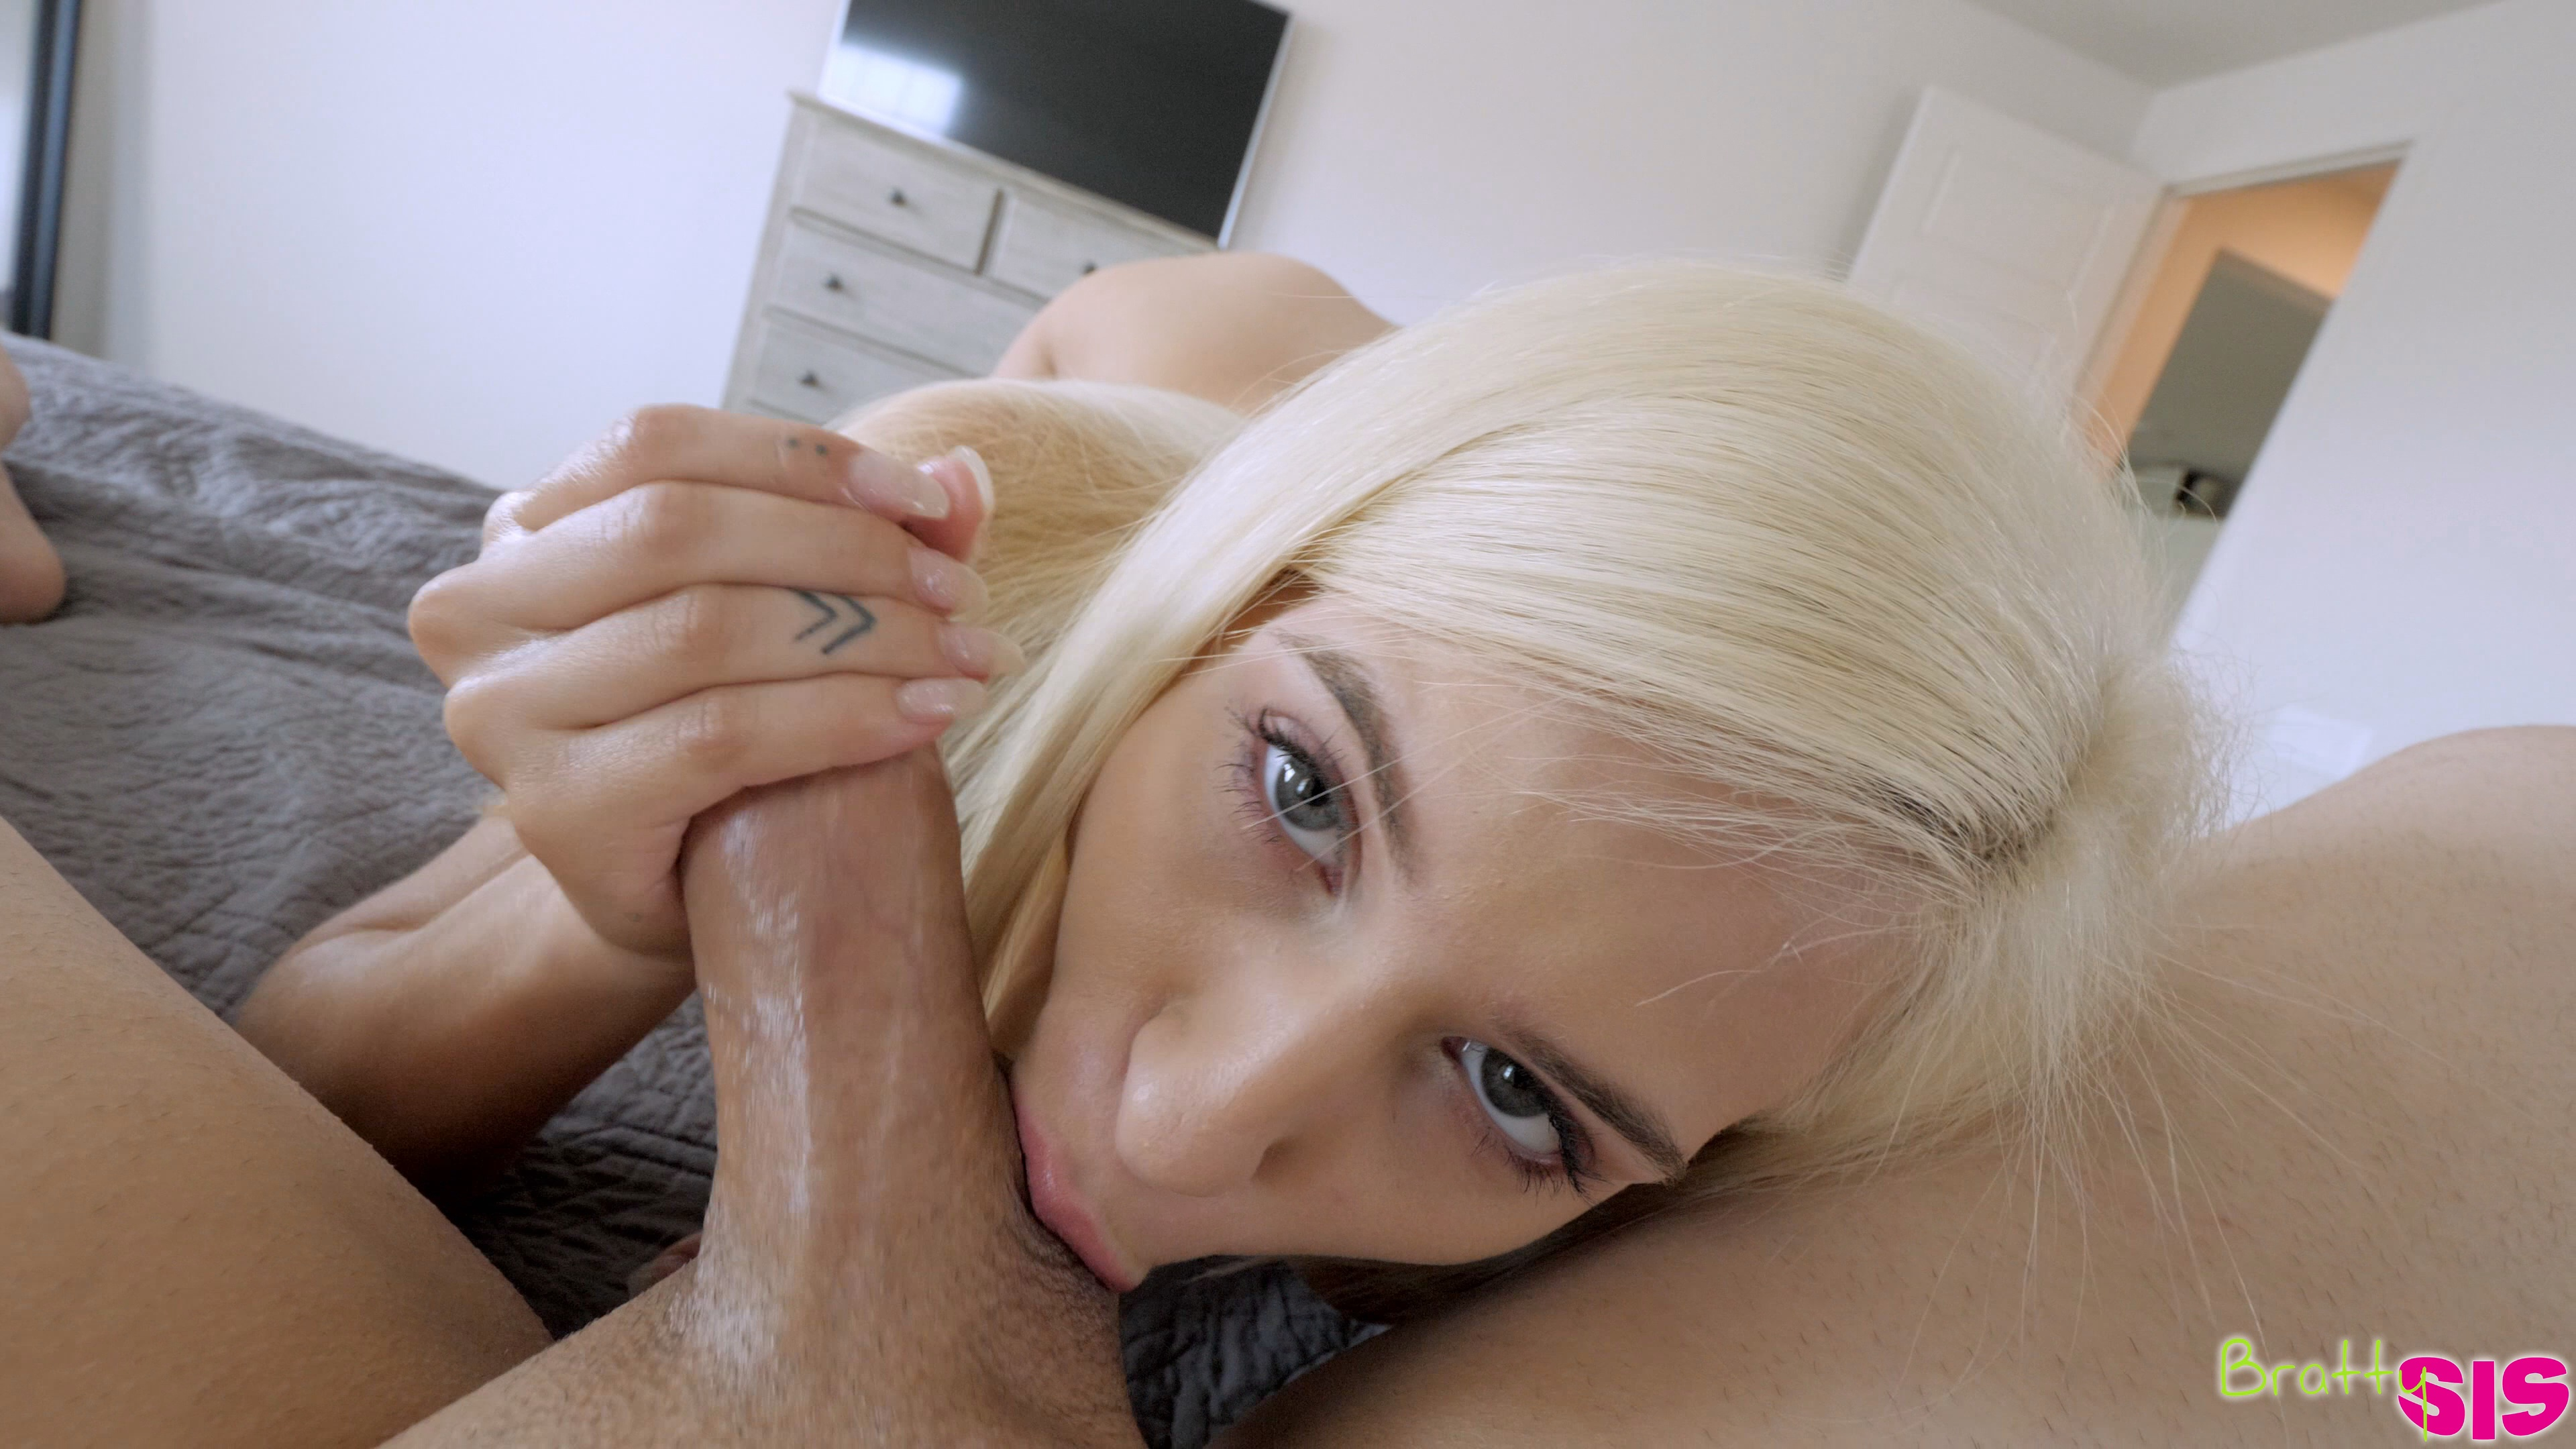 Skinny blonde stepdaughter fucking daddy